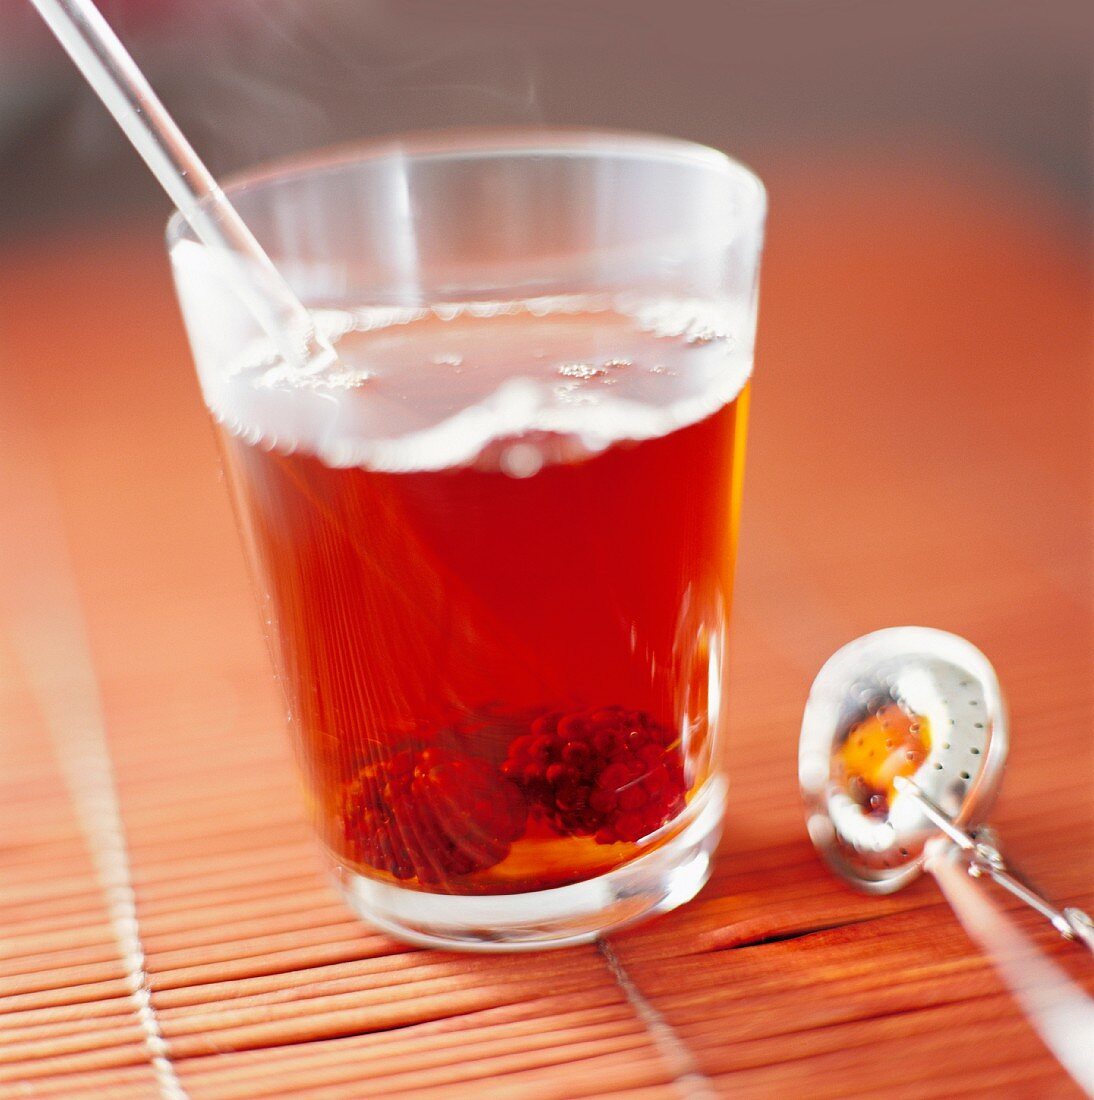 Fruit tea in a glass next to a tea ball